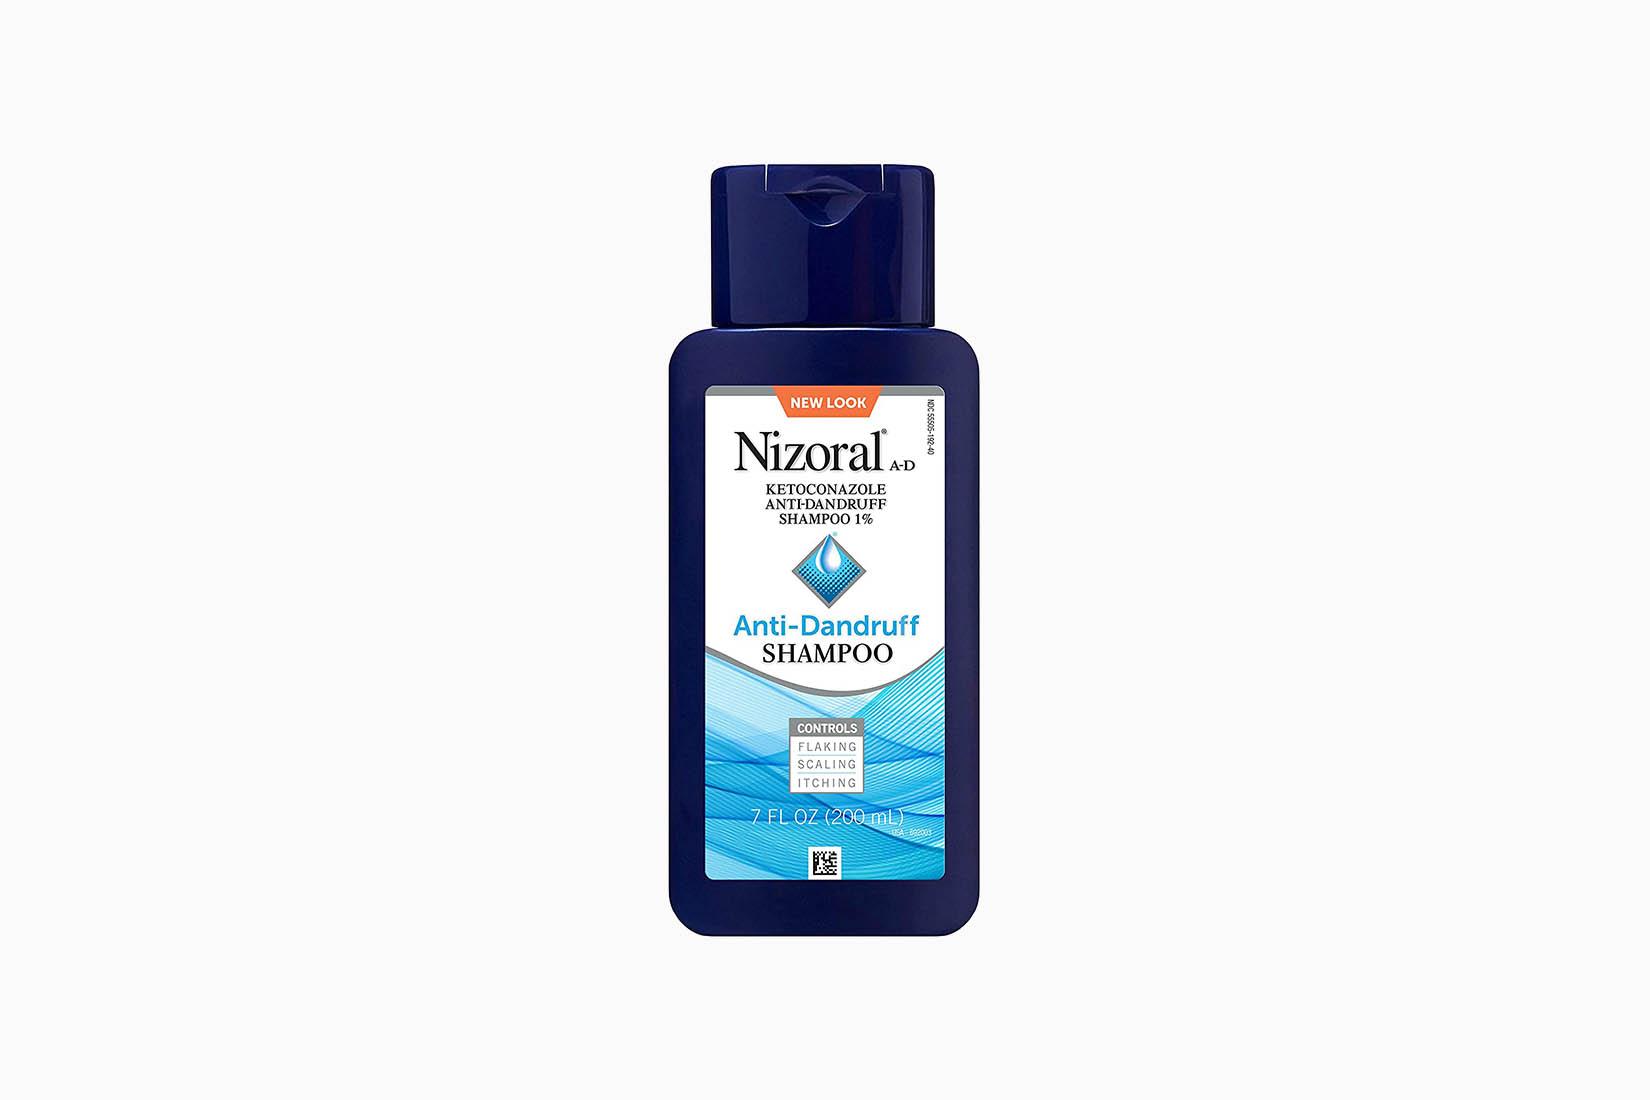 Best Hair Pura Dor Shampoo Men Nizoral Review - Luxe Digital